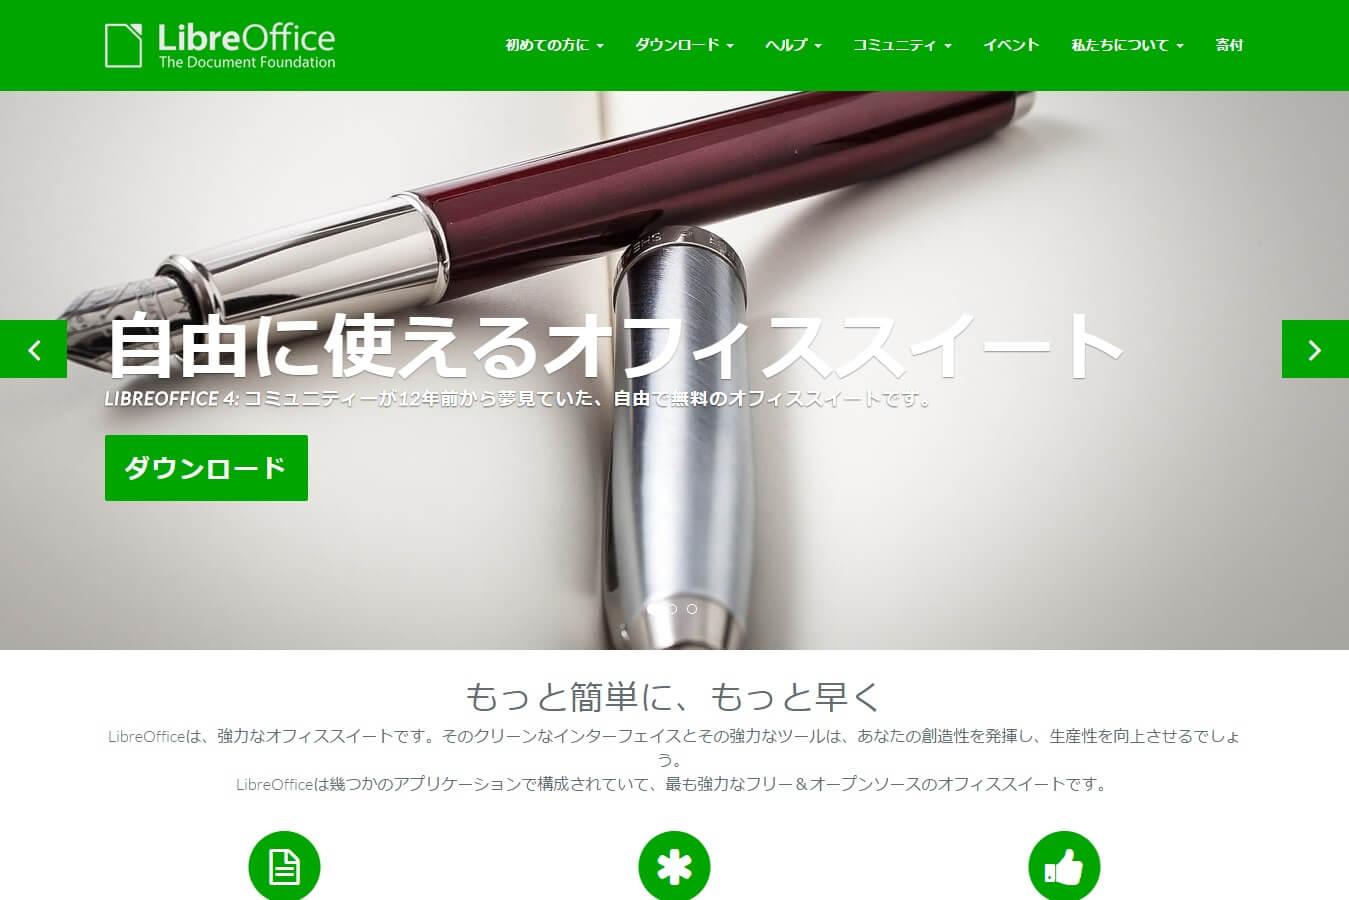 LibreOfficeのトップページ